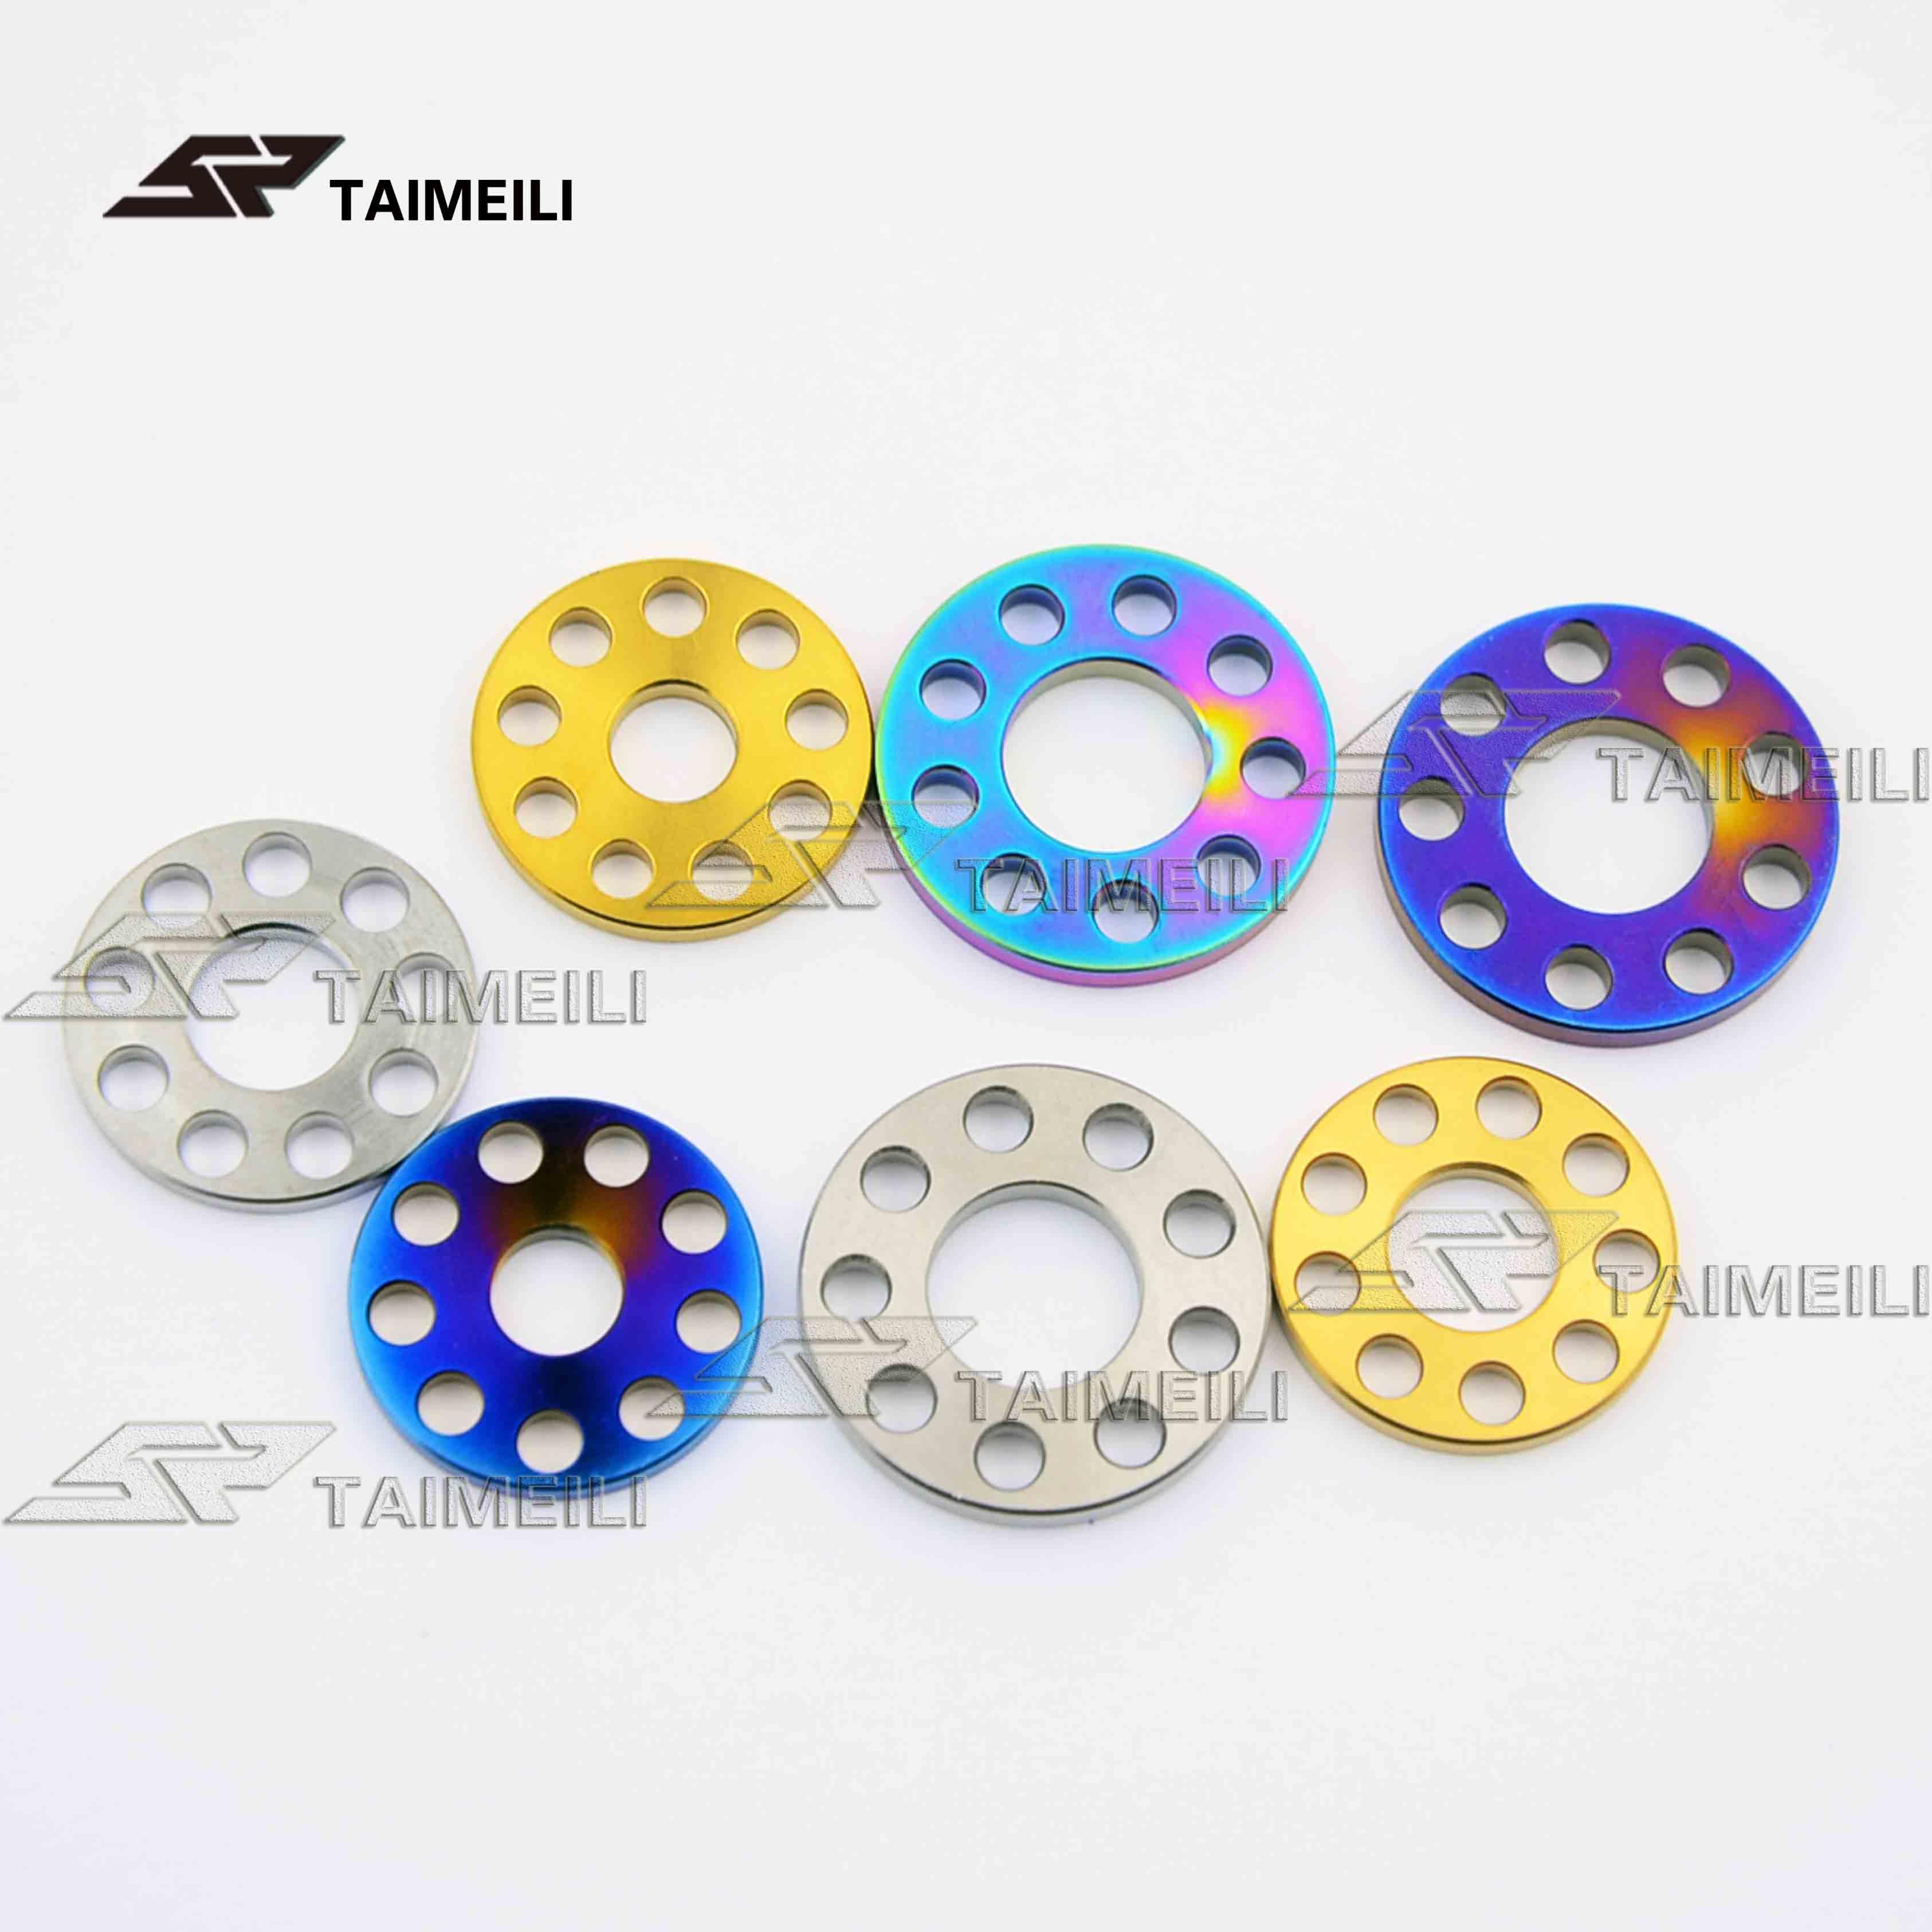 1pcs/titanium alloy drilling gasket, nine holes flat pad M6 M8 M10 motorcycle shell decorative gasket